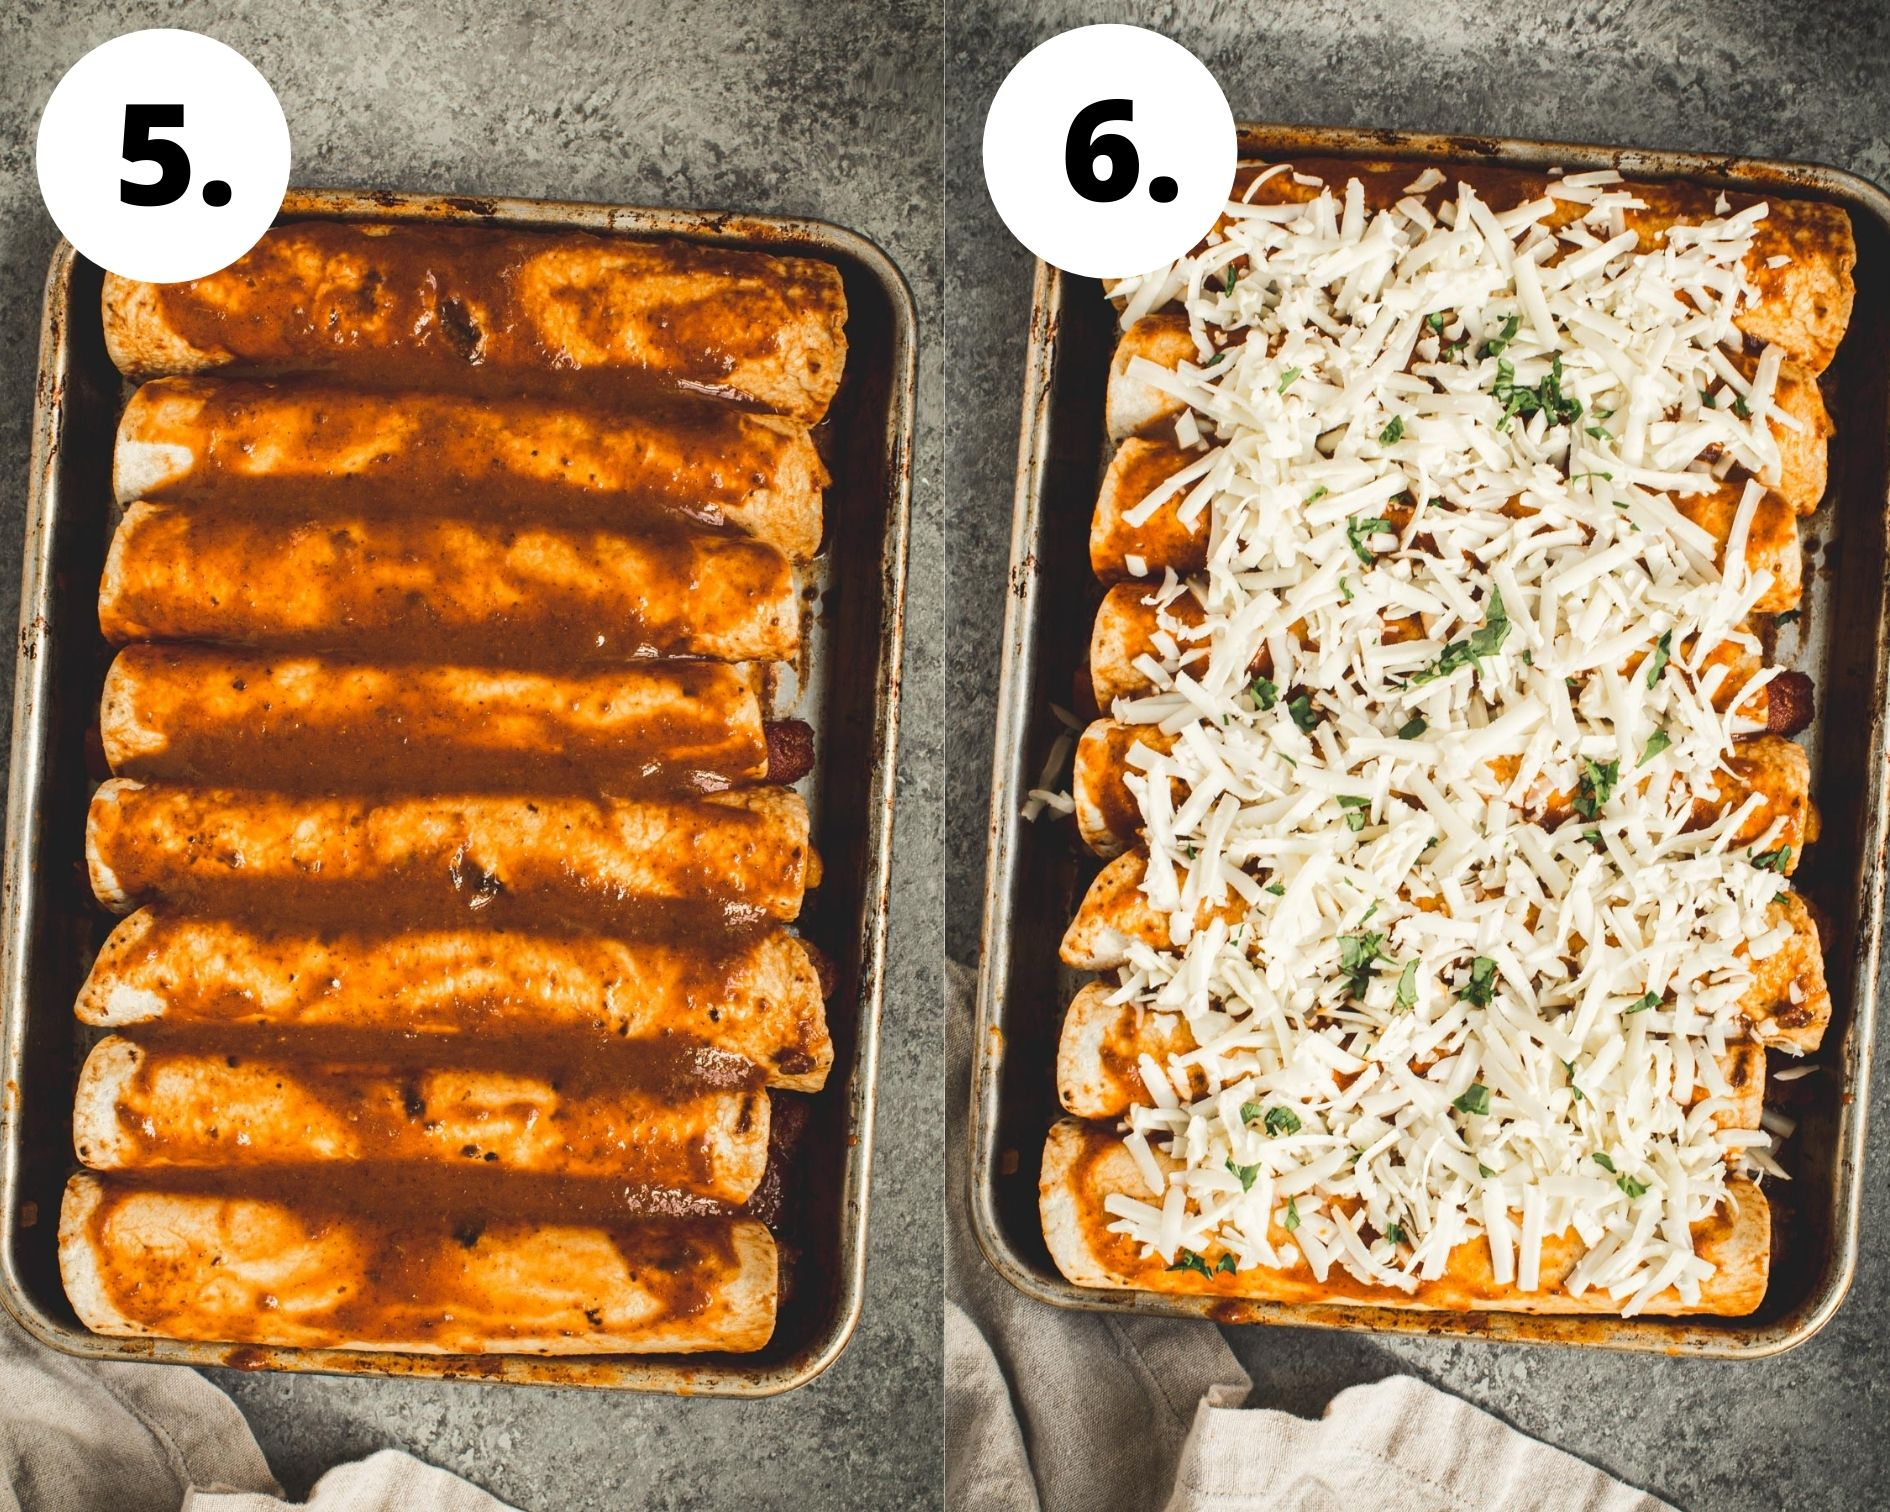 Butternut squash enchiladas process steps 5 and 6.